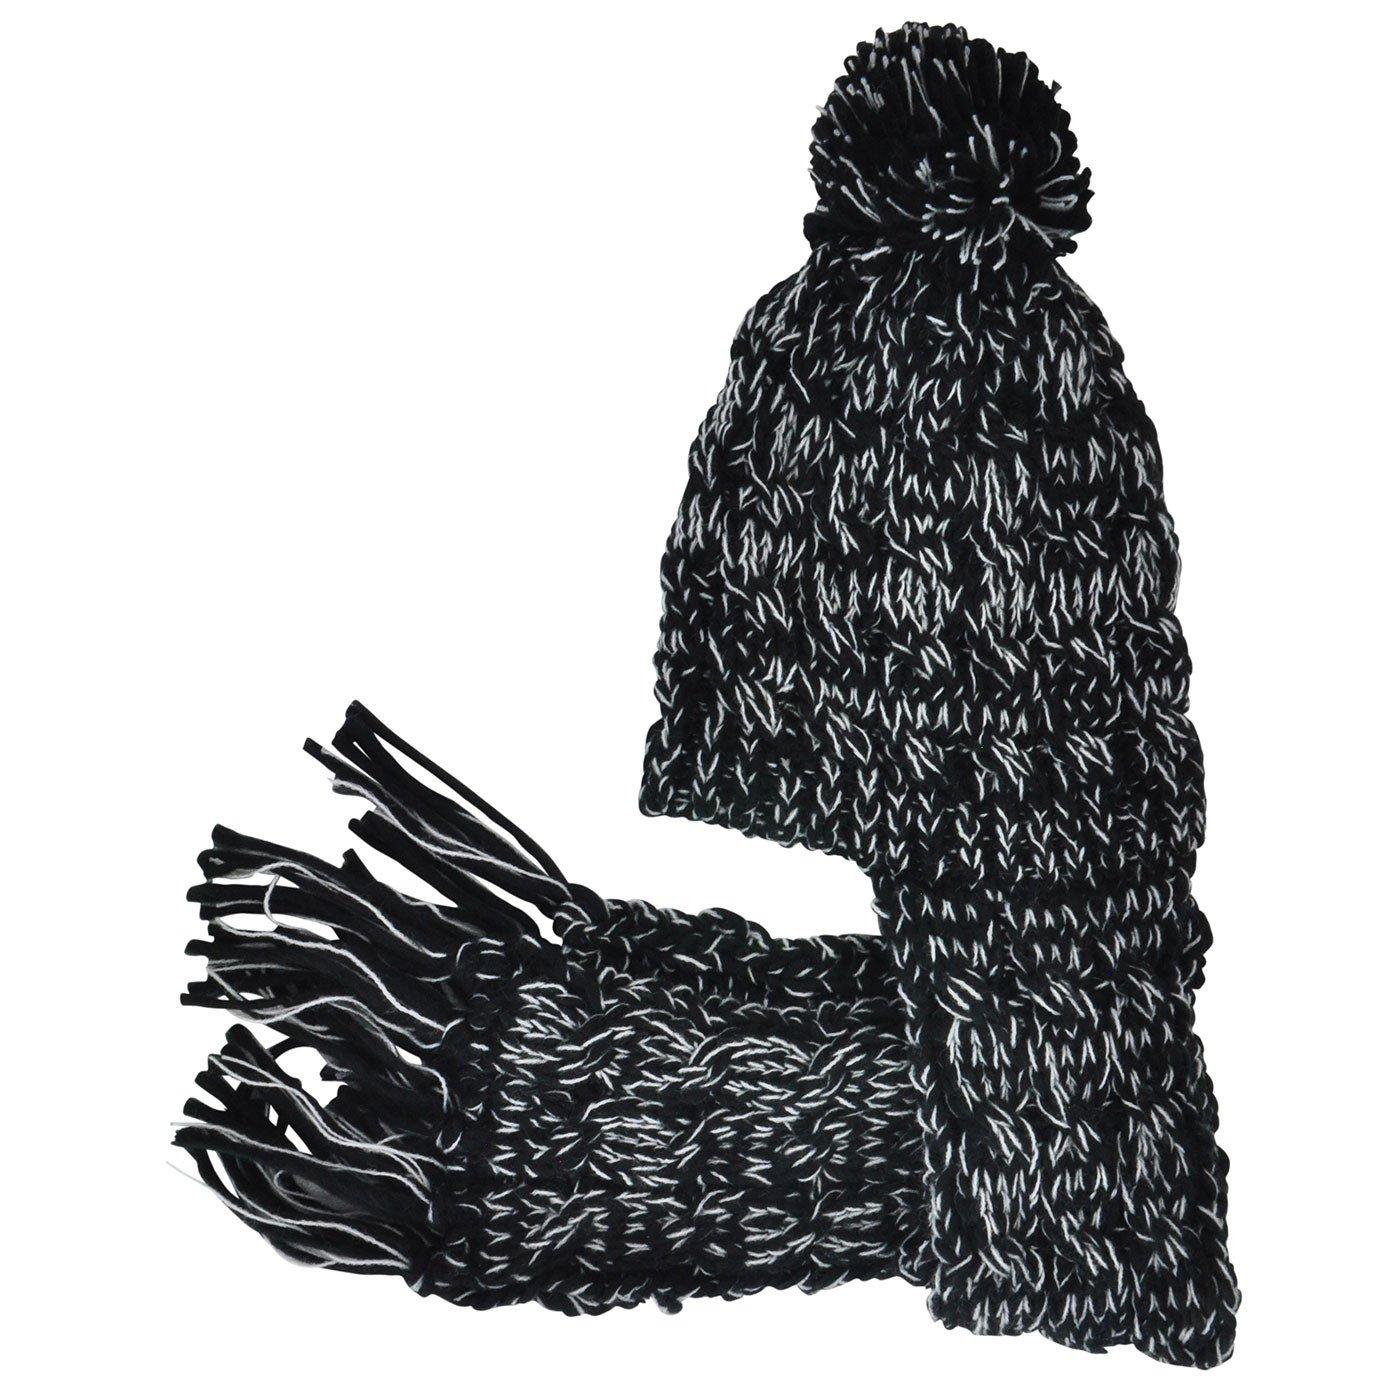 Ski Snowboard Kids Scarves Toque Black Neon Eaters Girls Knit Scarf Winter Hat Womens